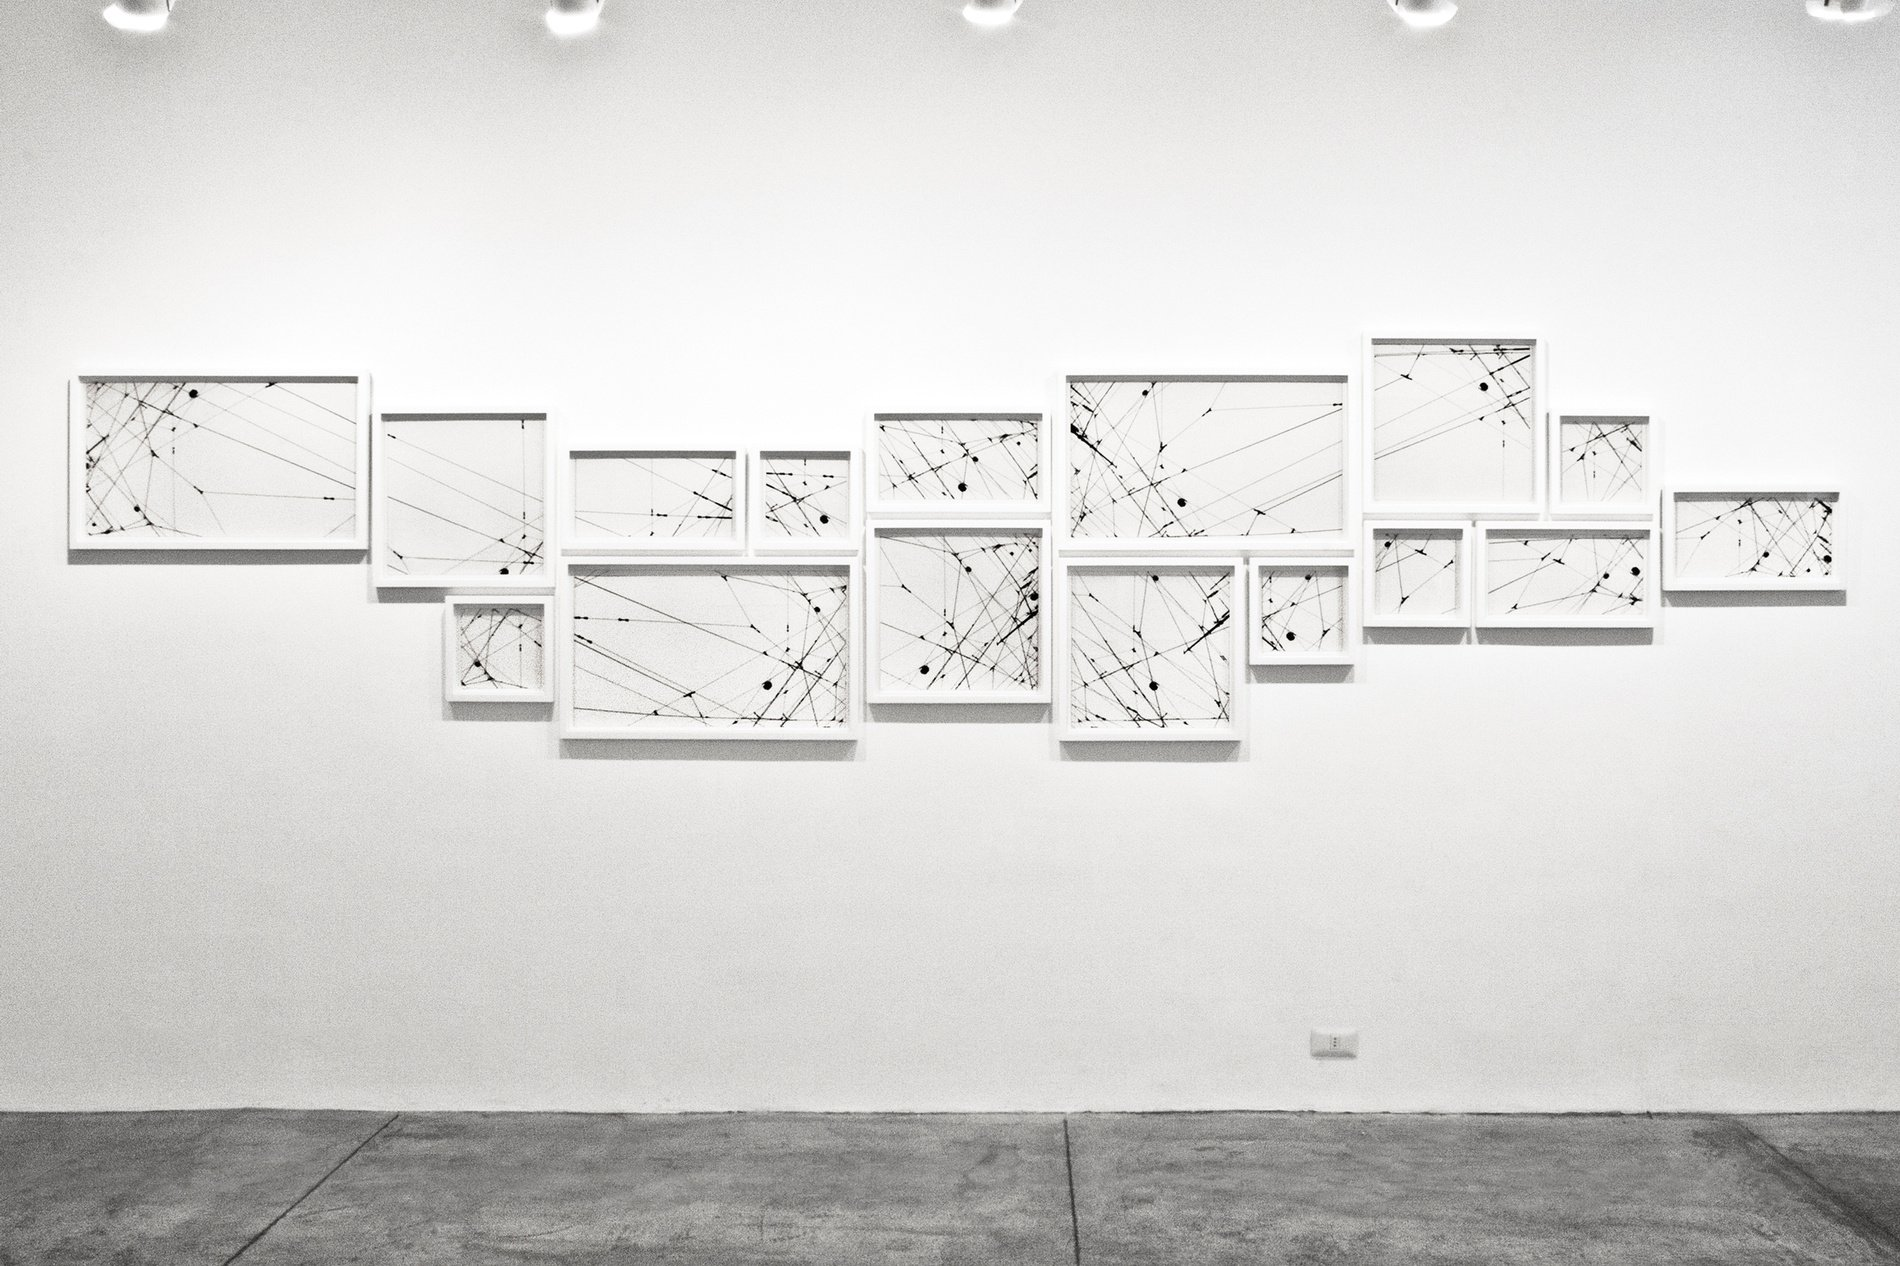 Lines 06-2